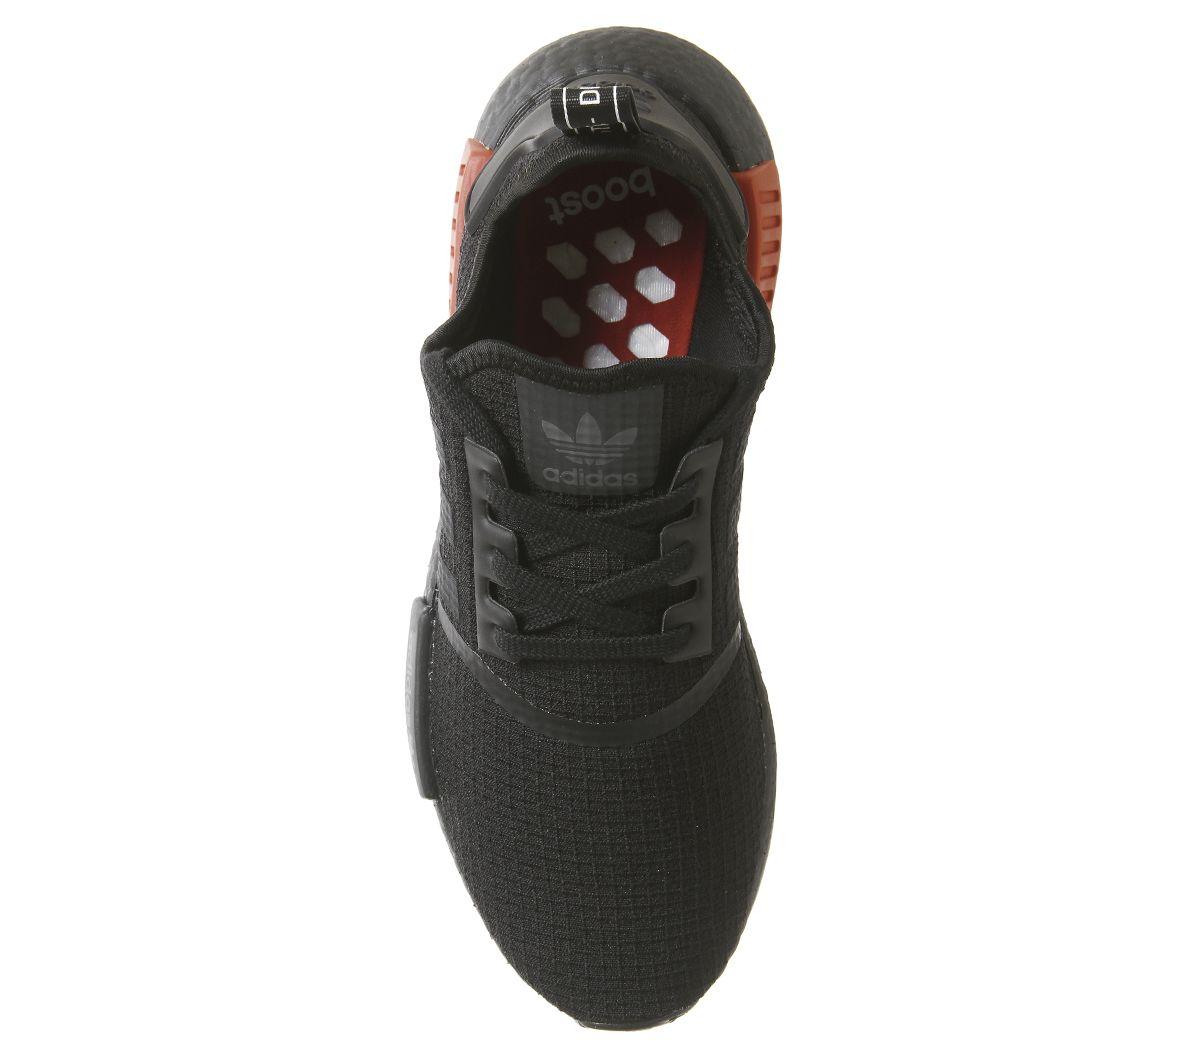 size 40 14aa7 5abb6 Adidas-Nmd-R1-Scarpe-Sportive-Core-Nero-Caldo-